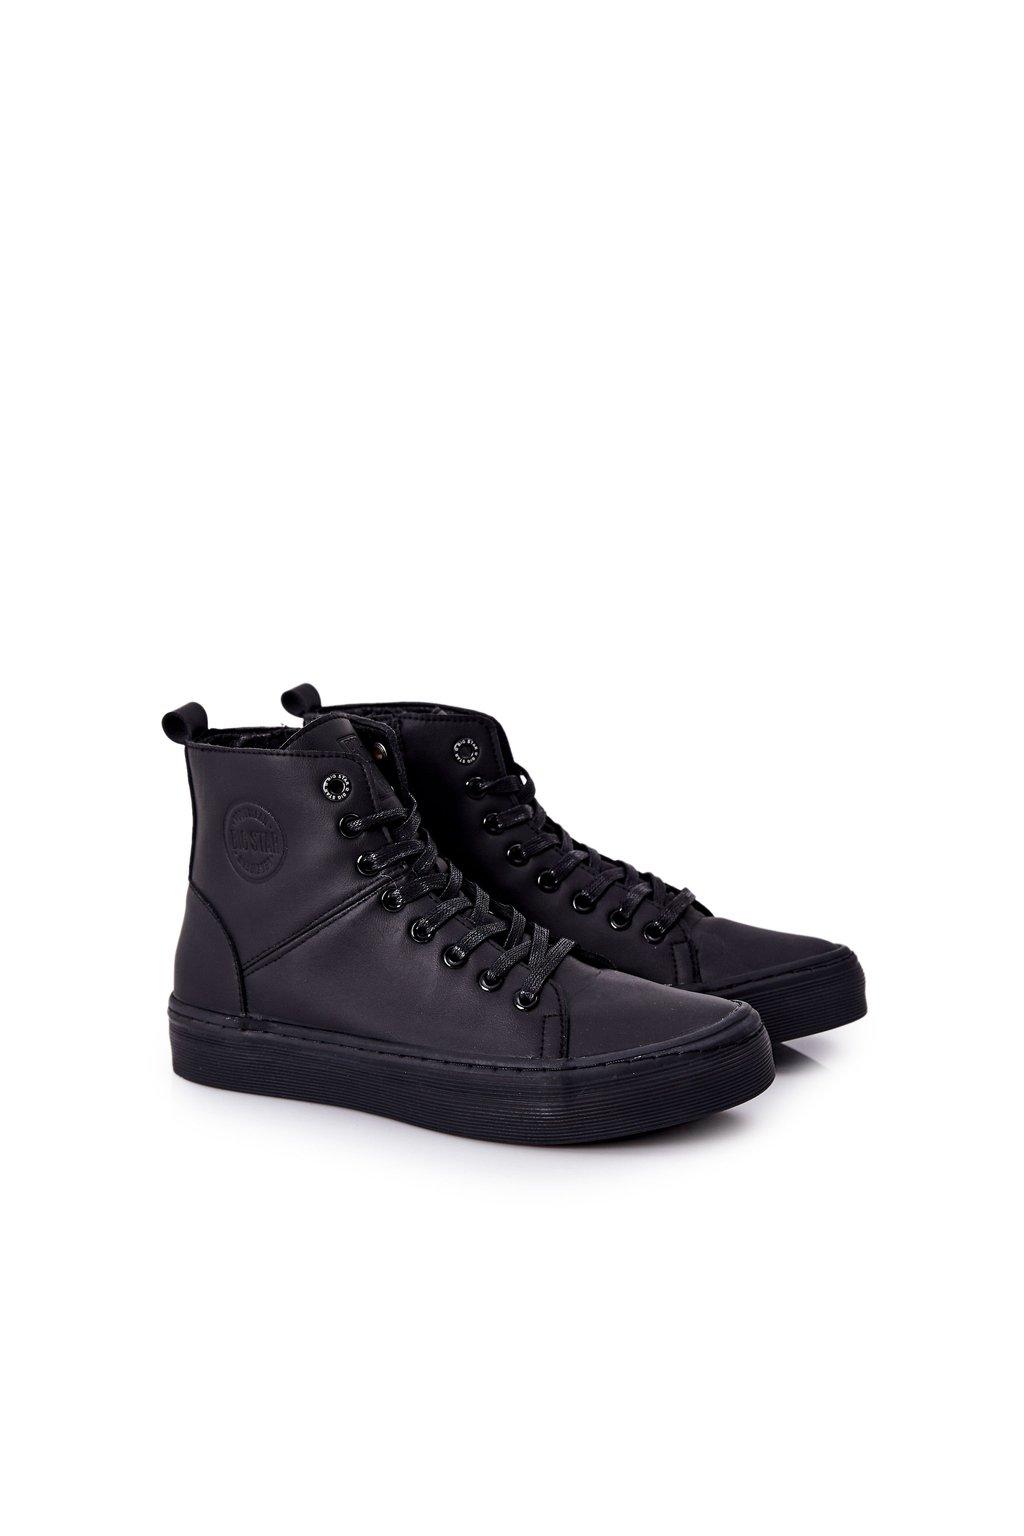 Čierna obuv kód topánok II174048 BLK